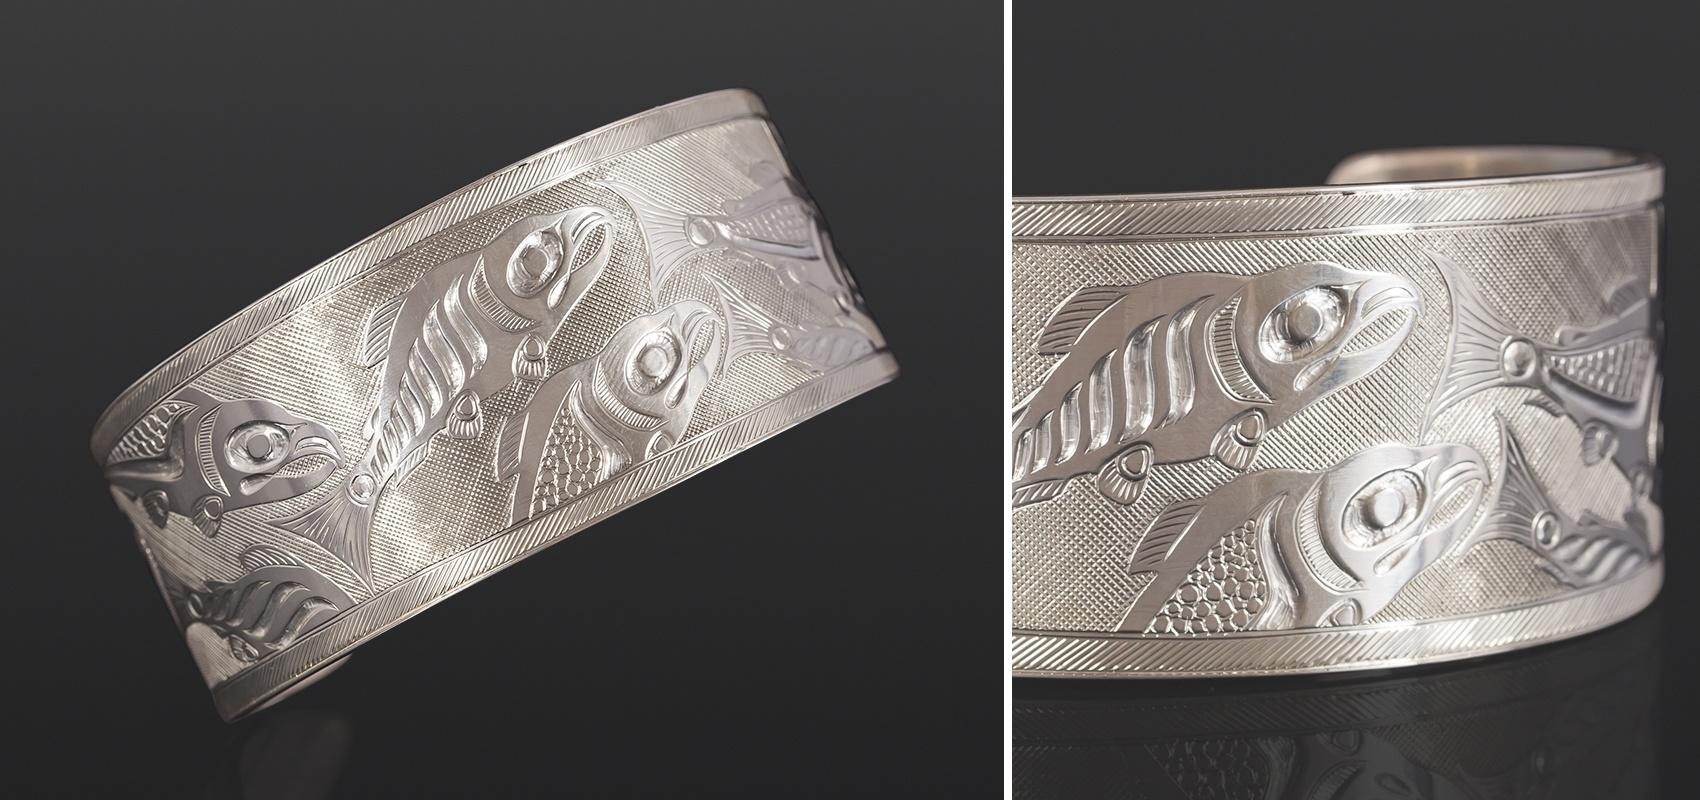 homecoming bracelet Allen Thompson Saulteaux Sterling silver 6½ x 1¼ 1000 salmon jewelry northwest coast native art